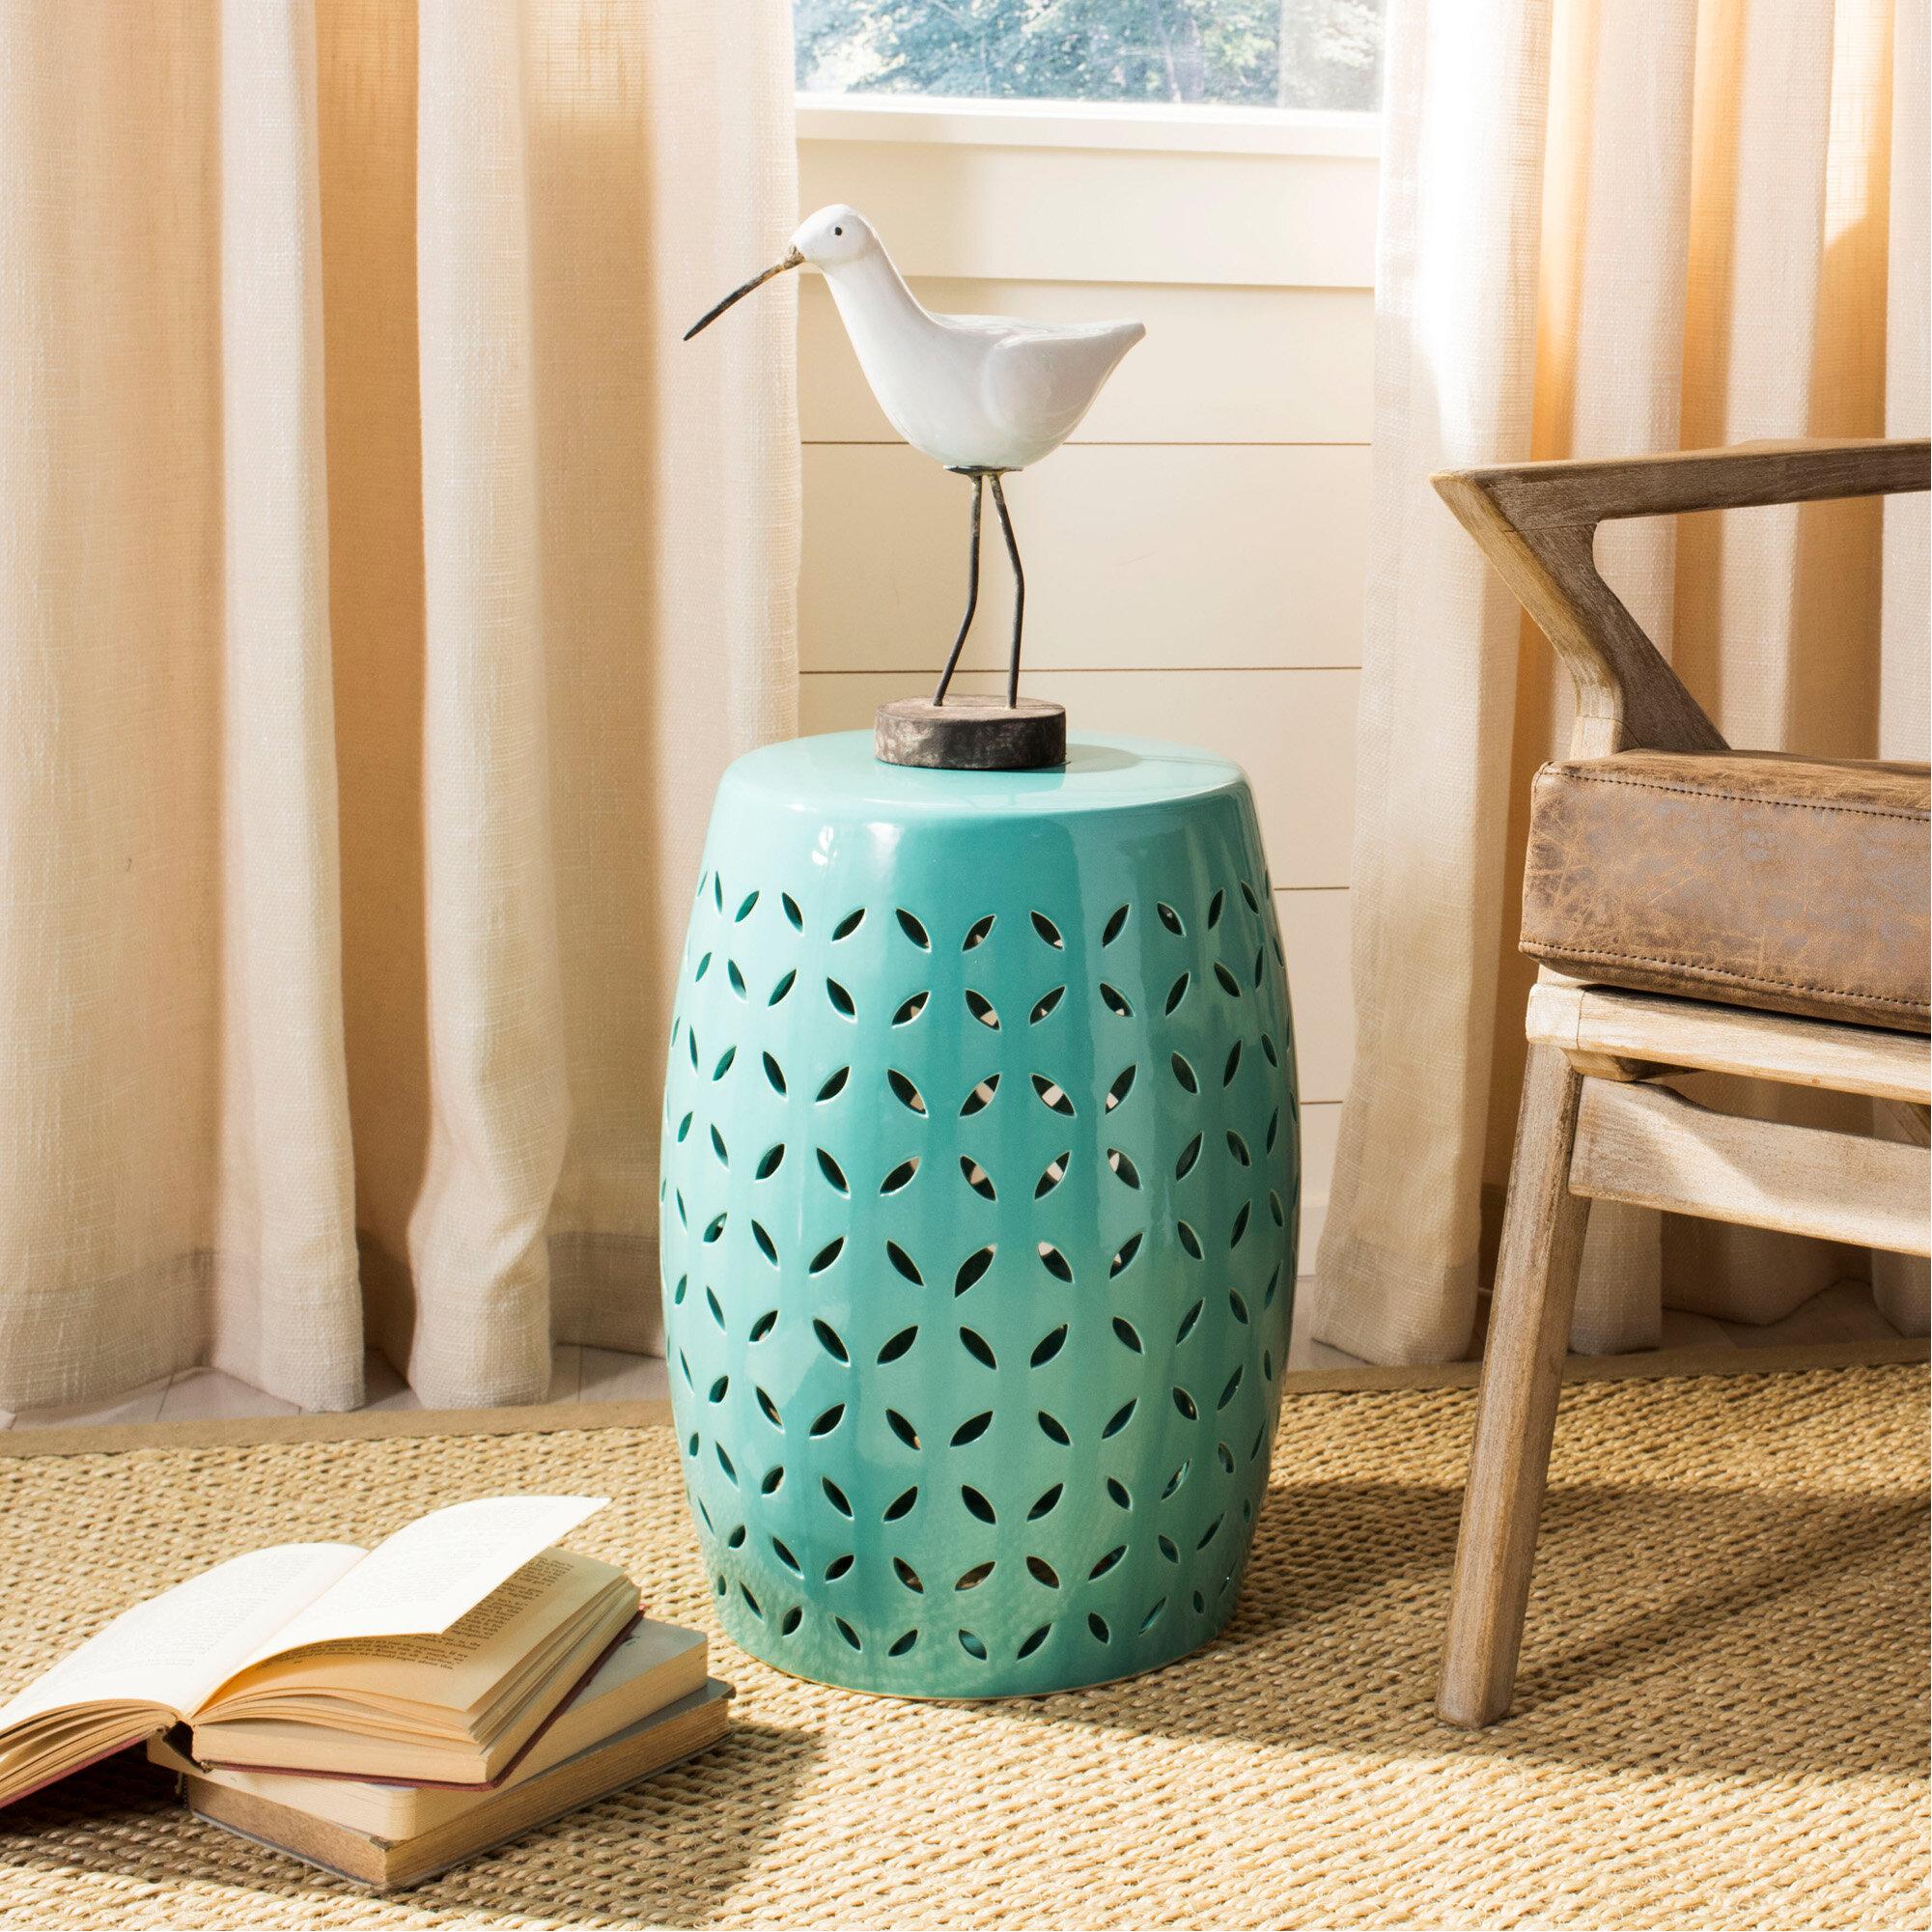 Feliciana Ceramic Garden Stool With Regard To Feliciana Ceramic Garden Stools (View 5 of 25)